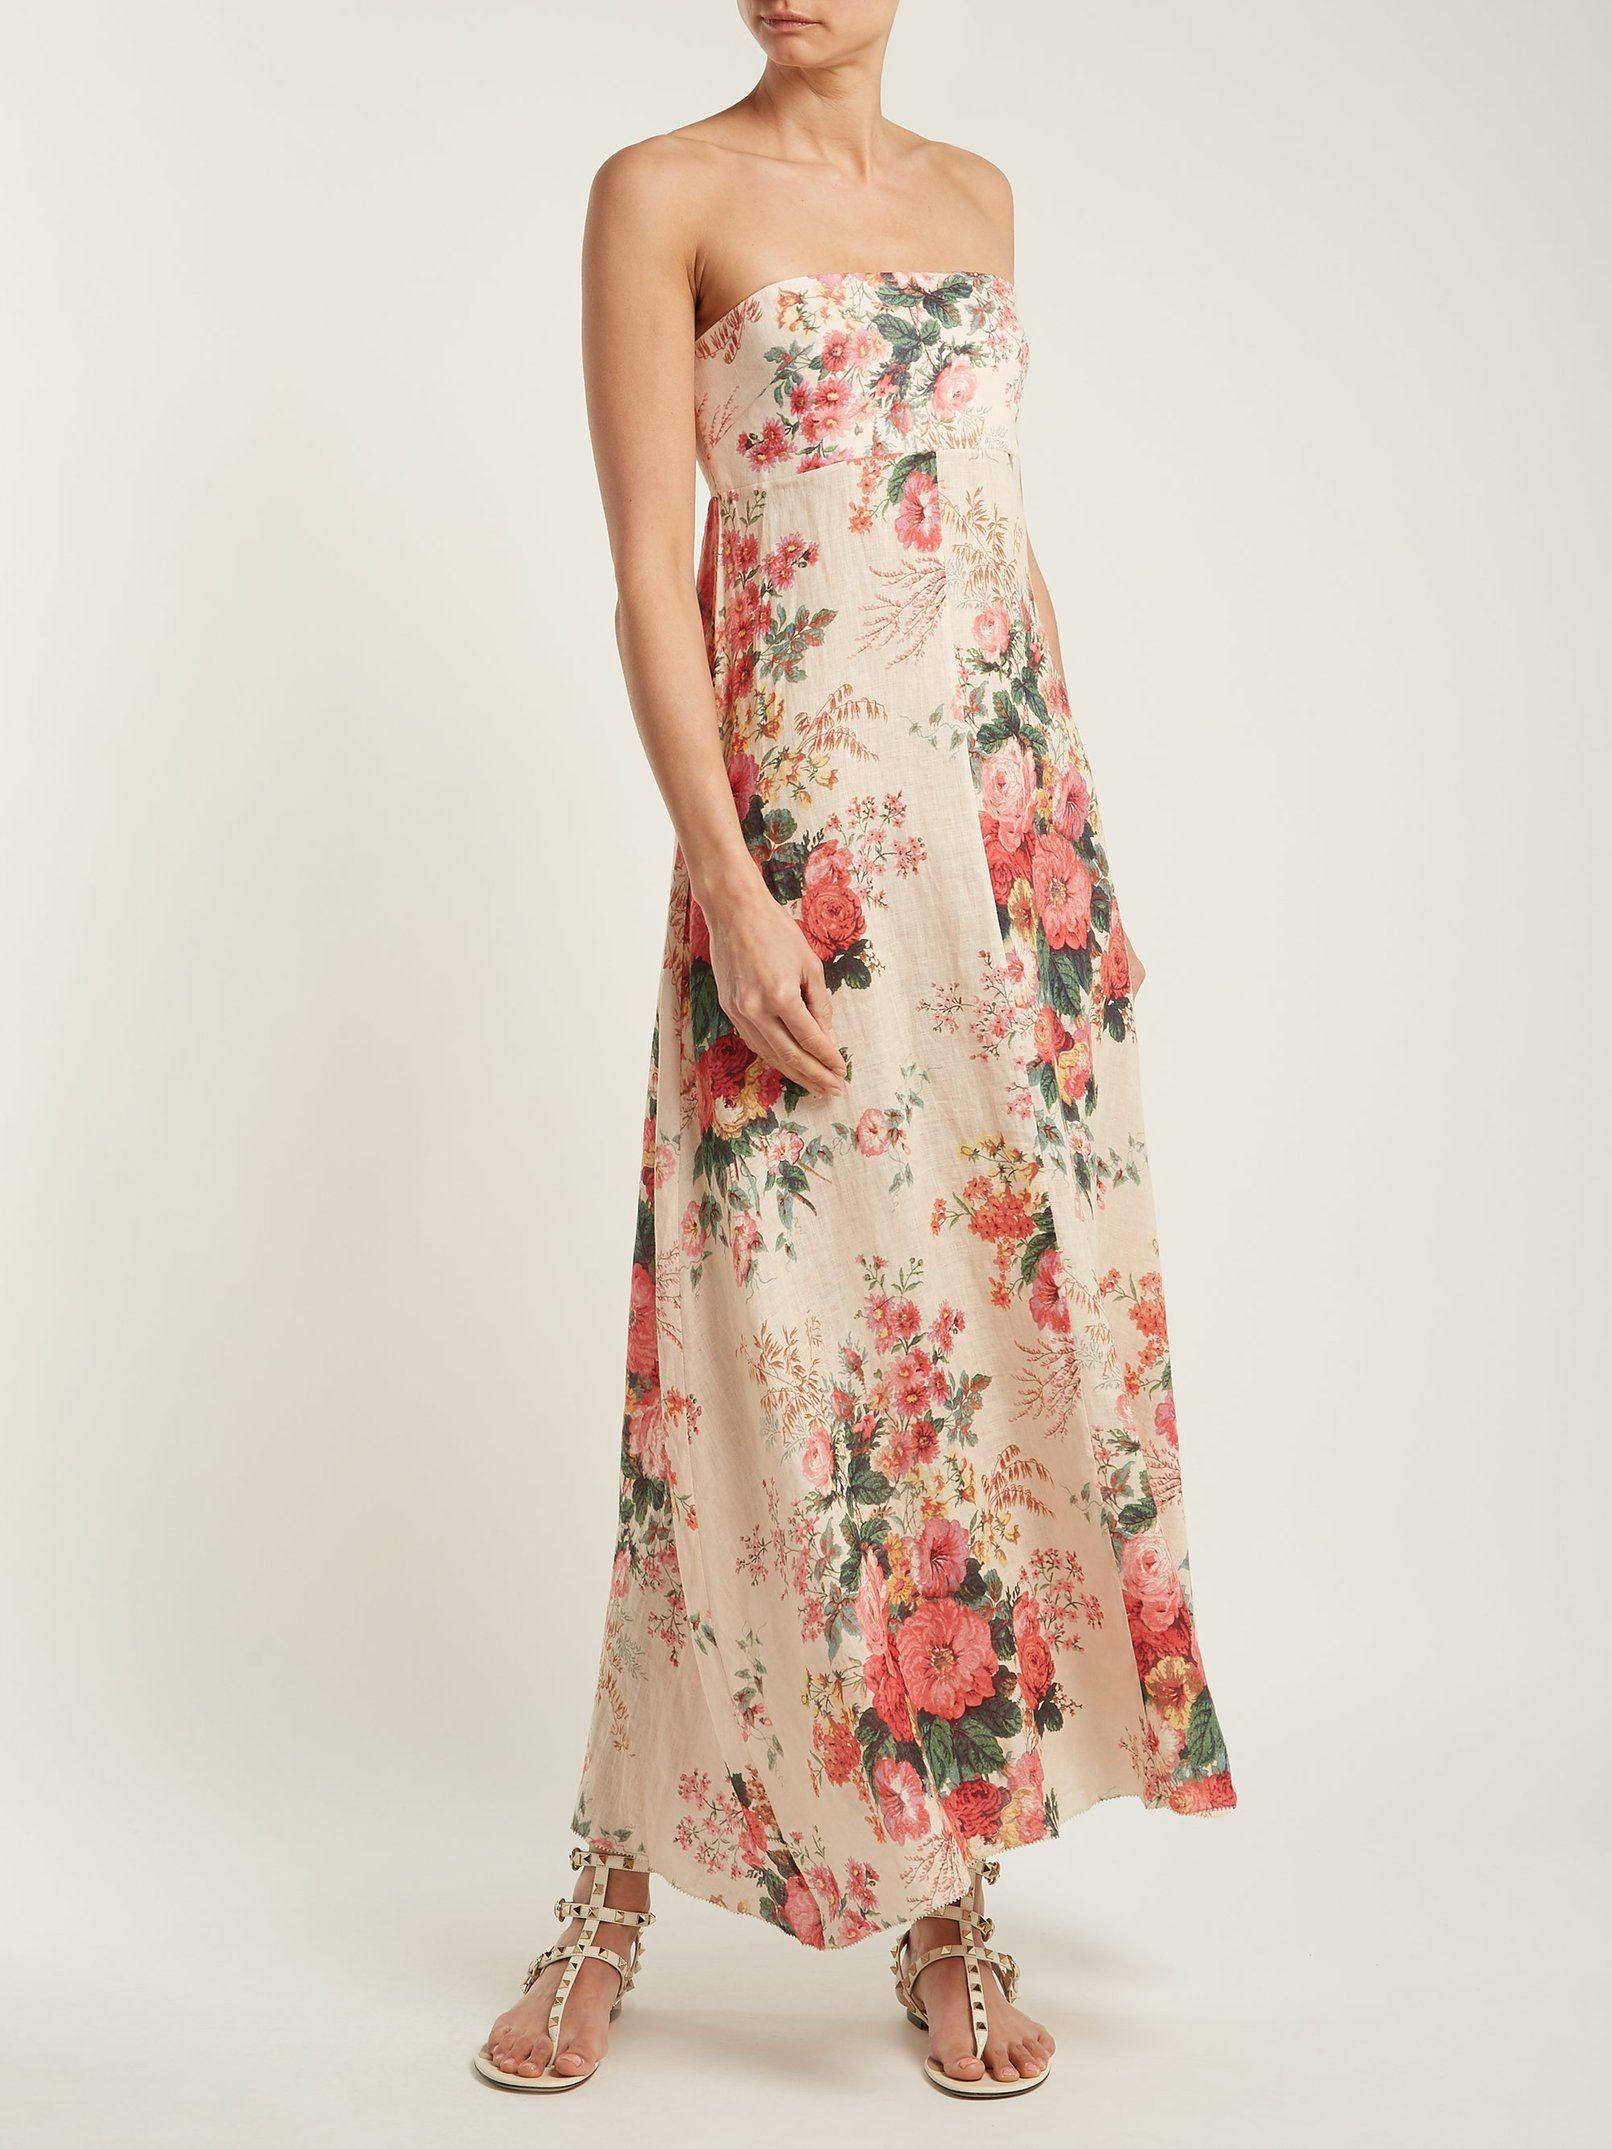 4a19395f2d94 Laeila floral-printed linen dress